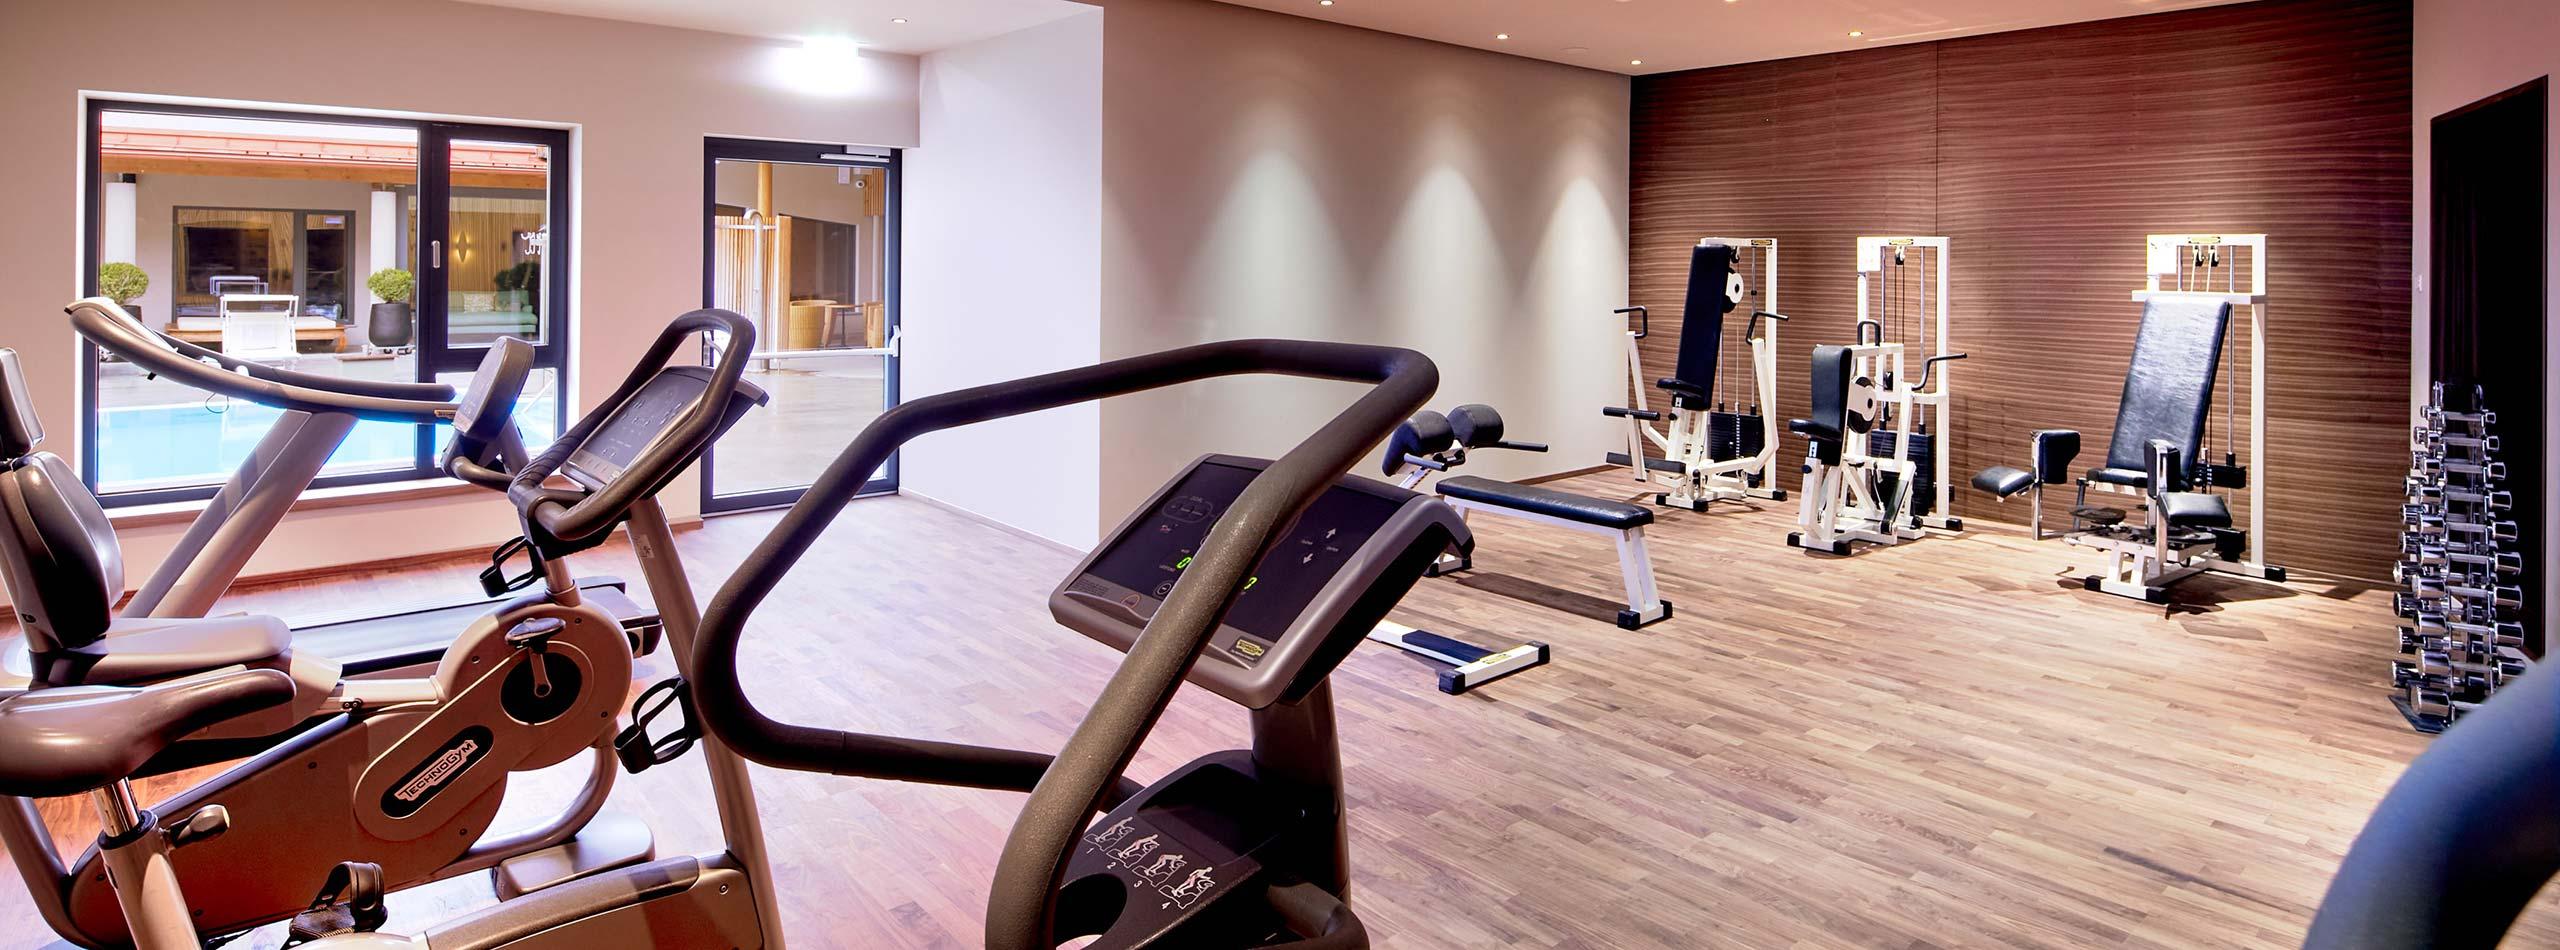 Fitness - Yoga Resort Mandira Bad Waltersdorf Steiermark